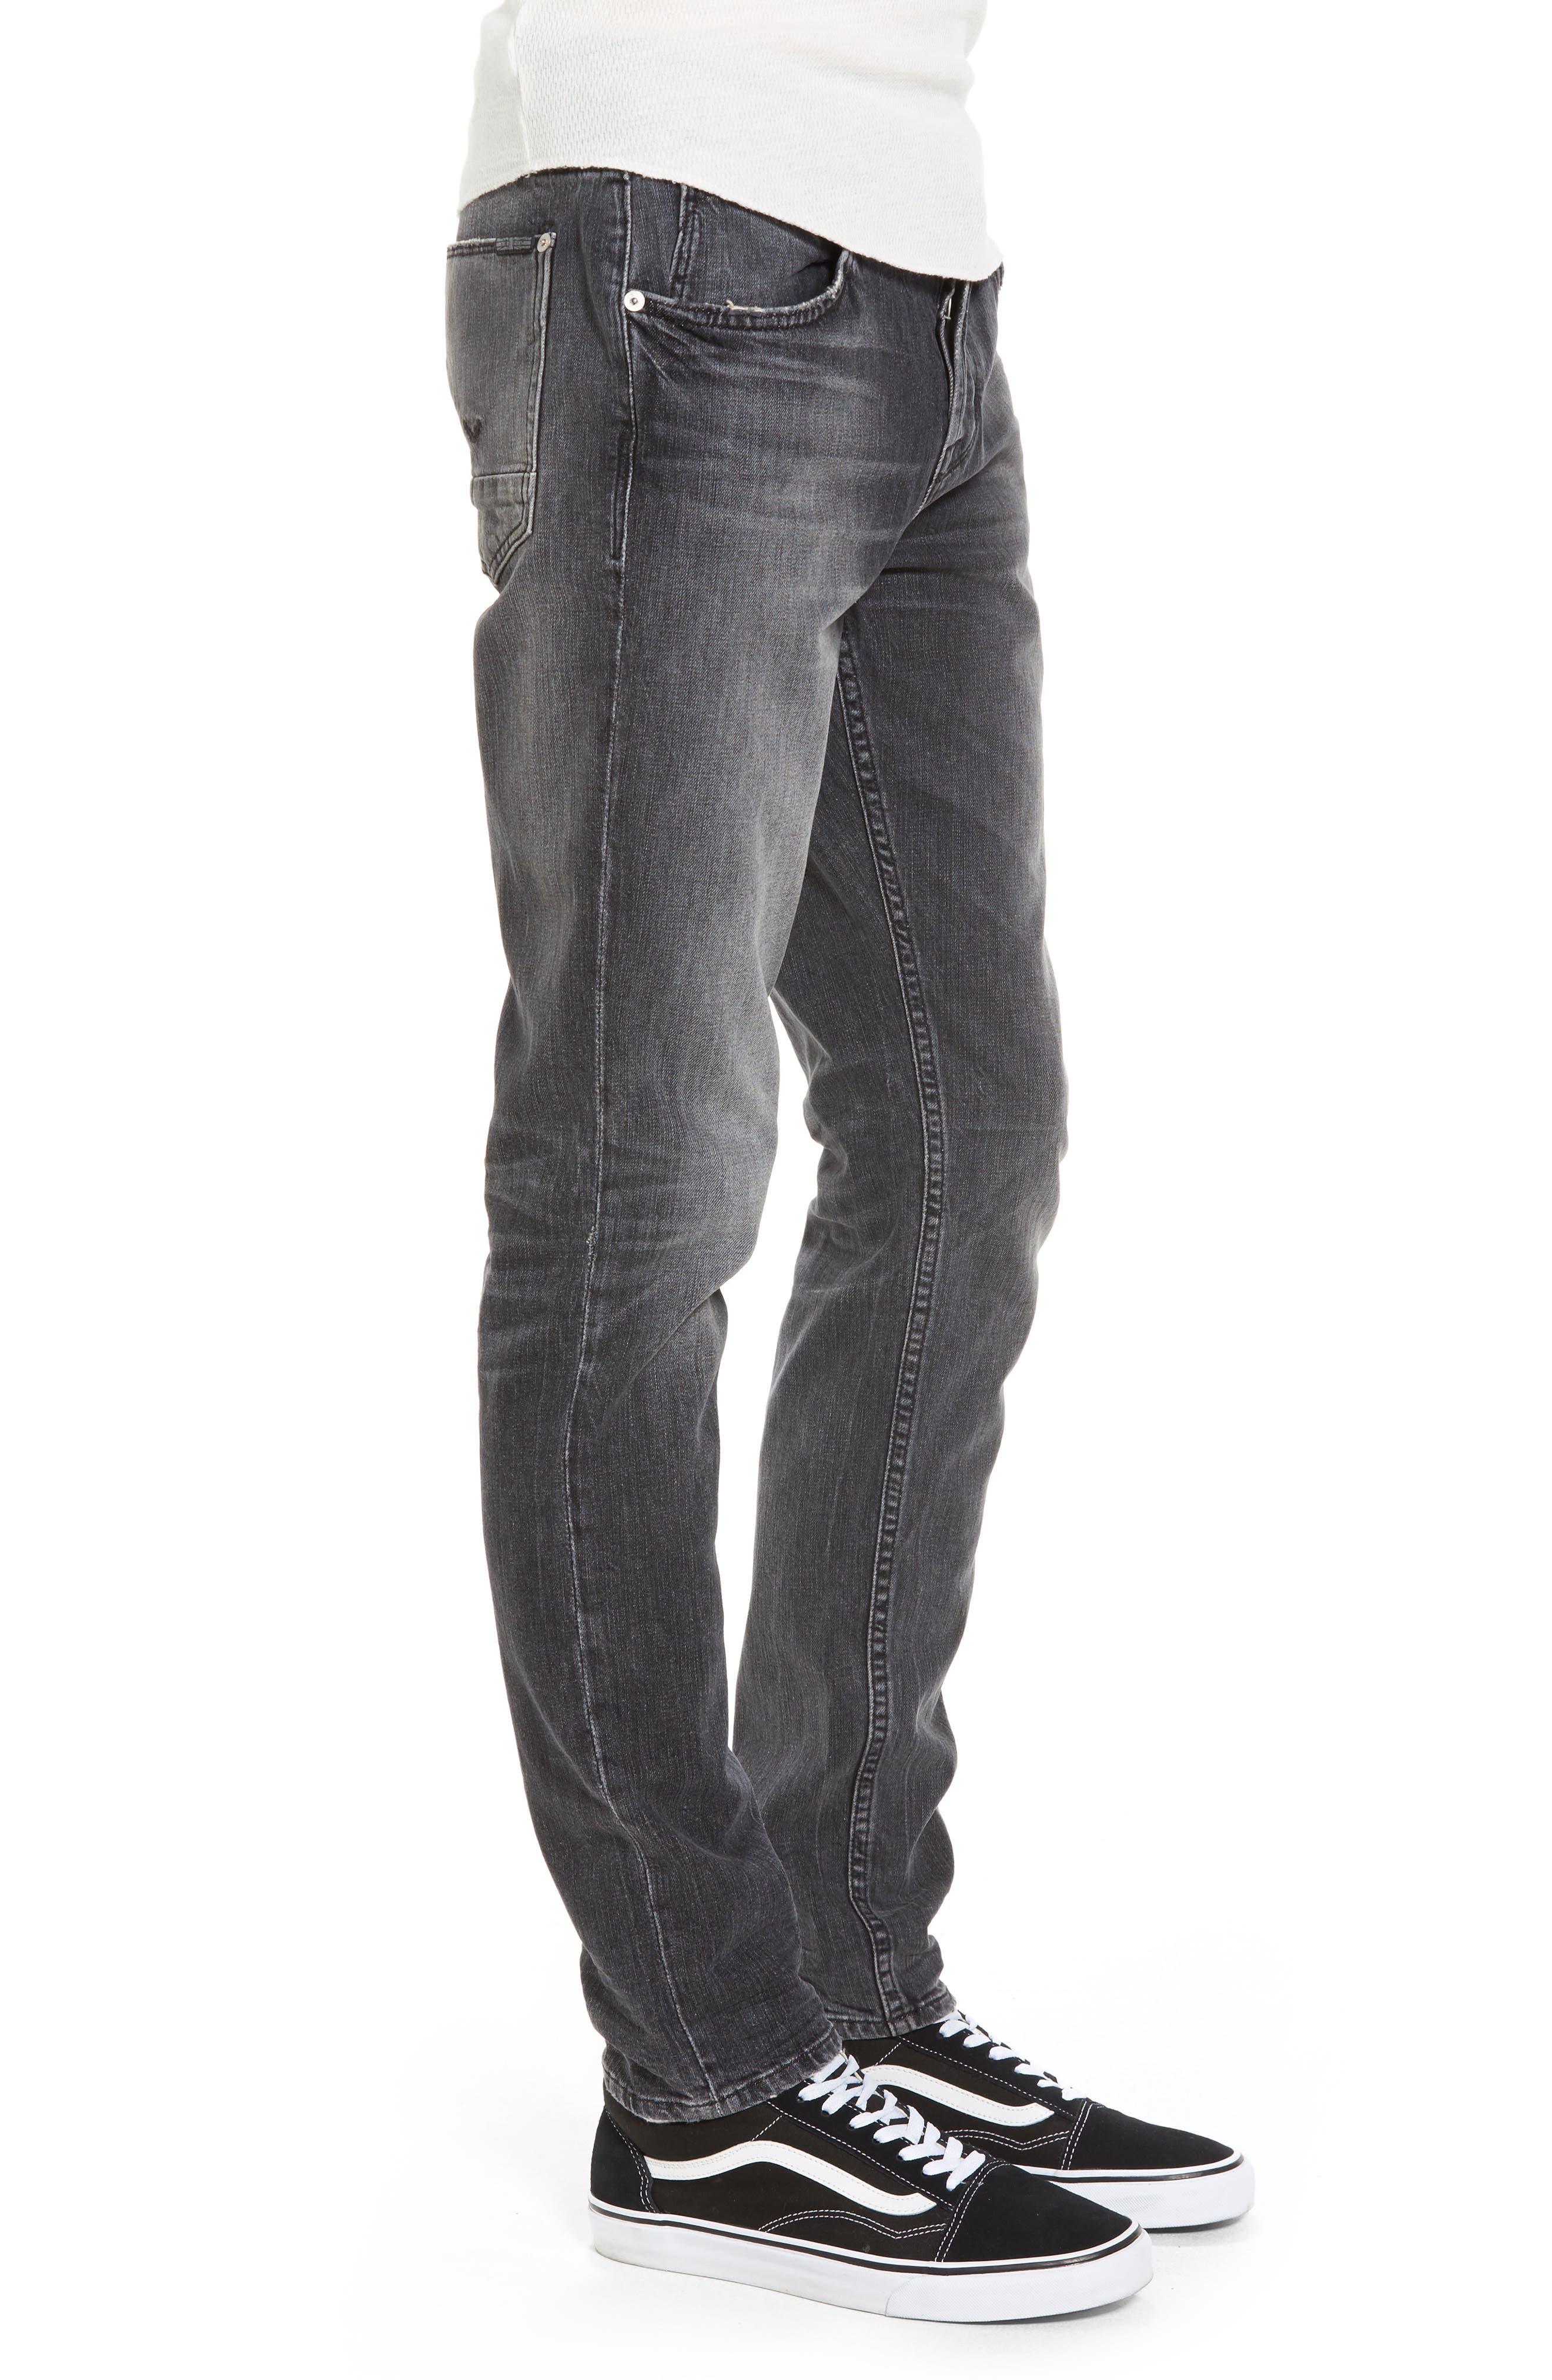 Axl Skinny Fit Jeans,                             Alternate thumbnail 3, color,                             Venture